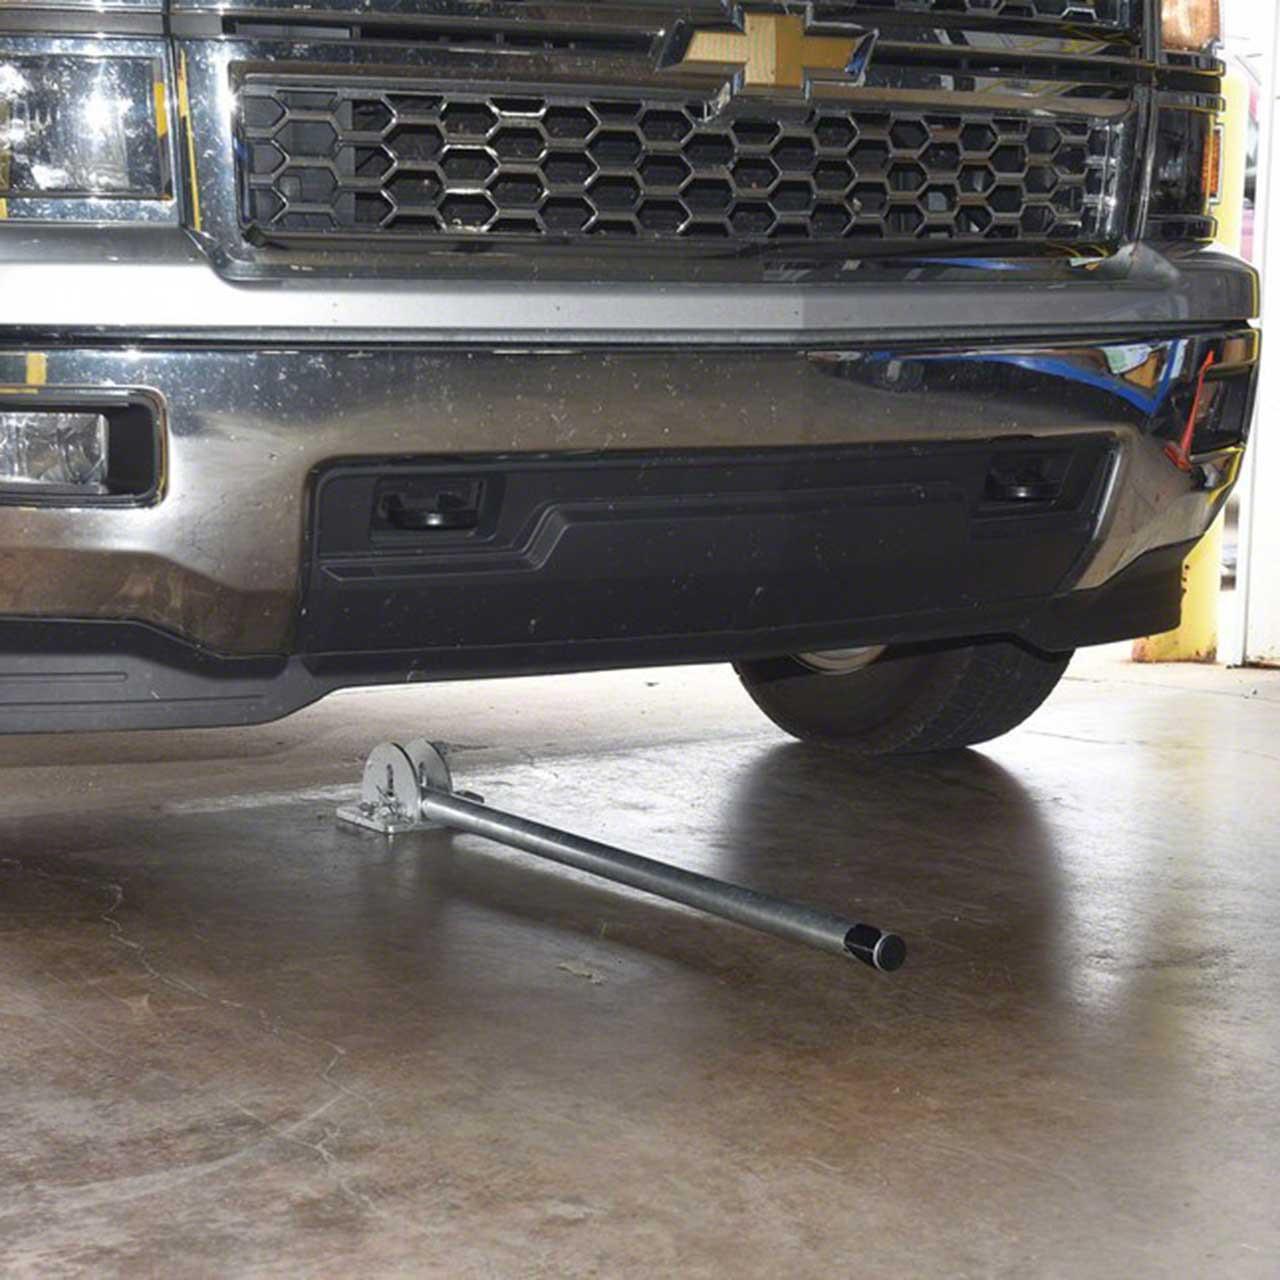 Galvanized steel bollard in fold-down position